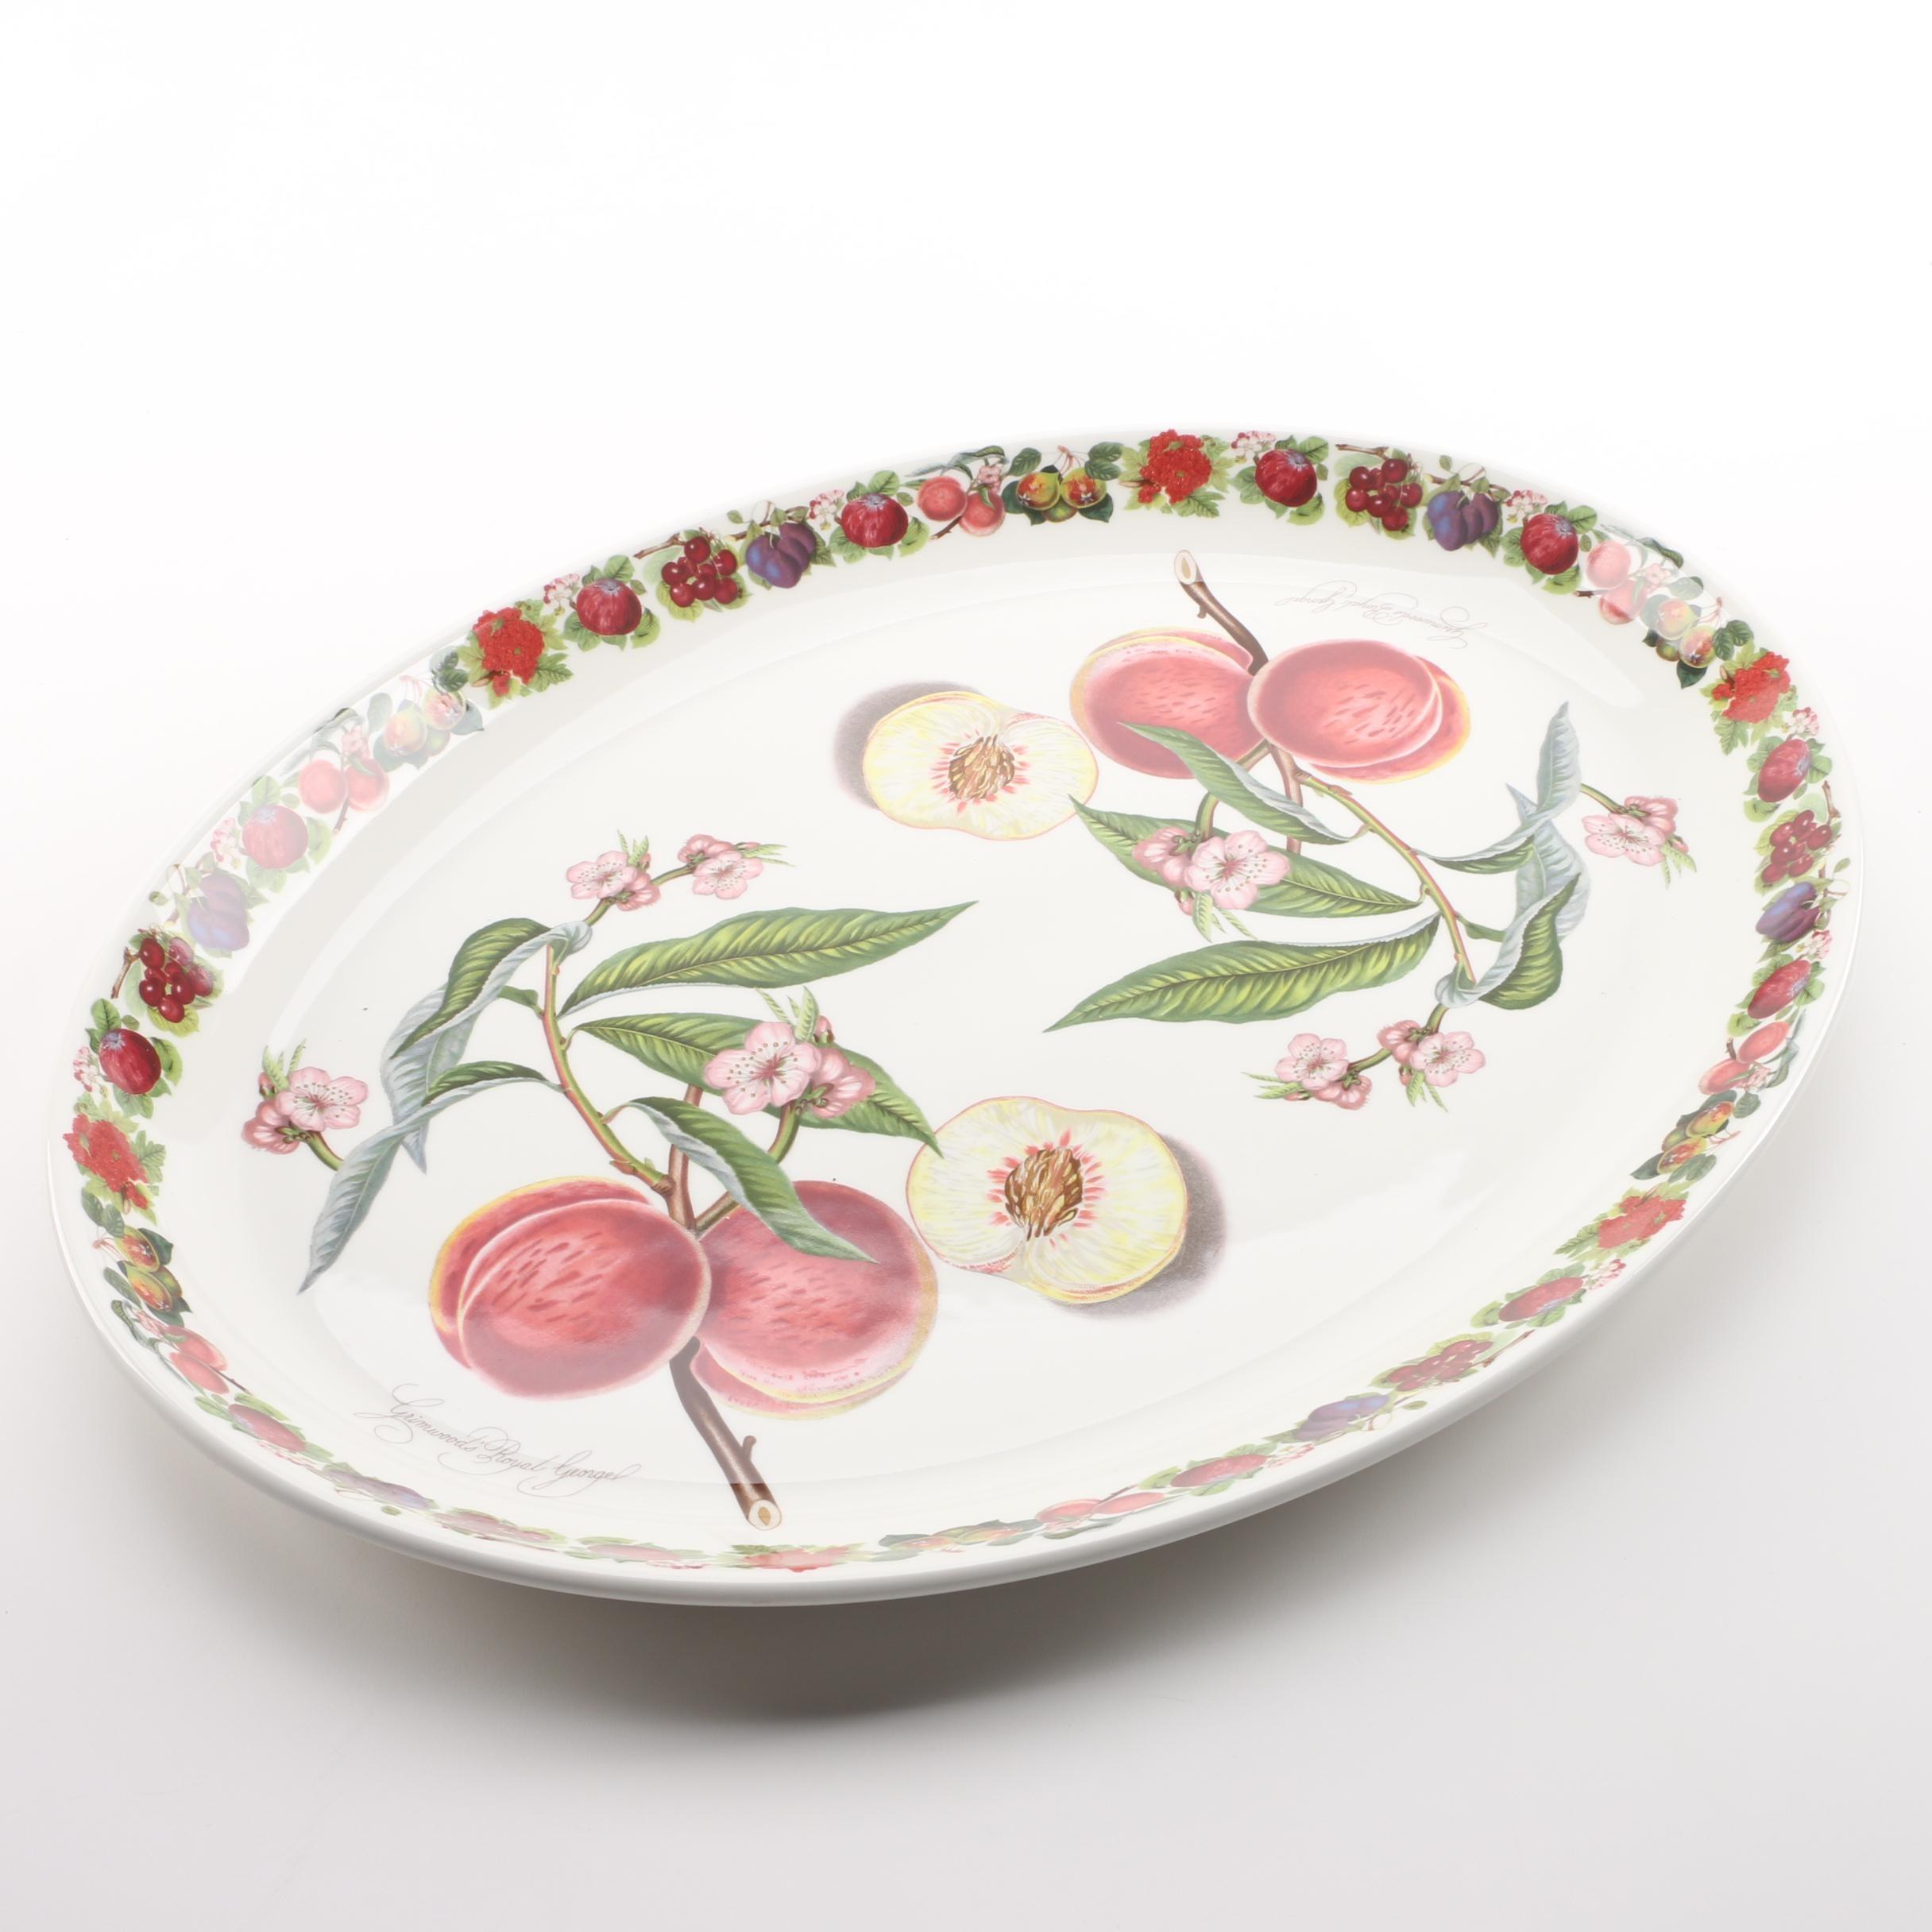 "Portmeirion Pomona ""Grimwoods Royal George Peach"" Porcelain Tray"